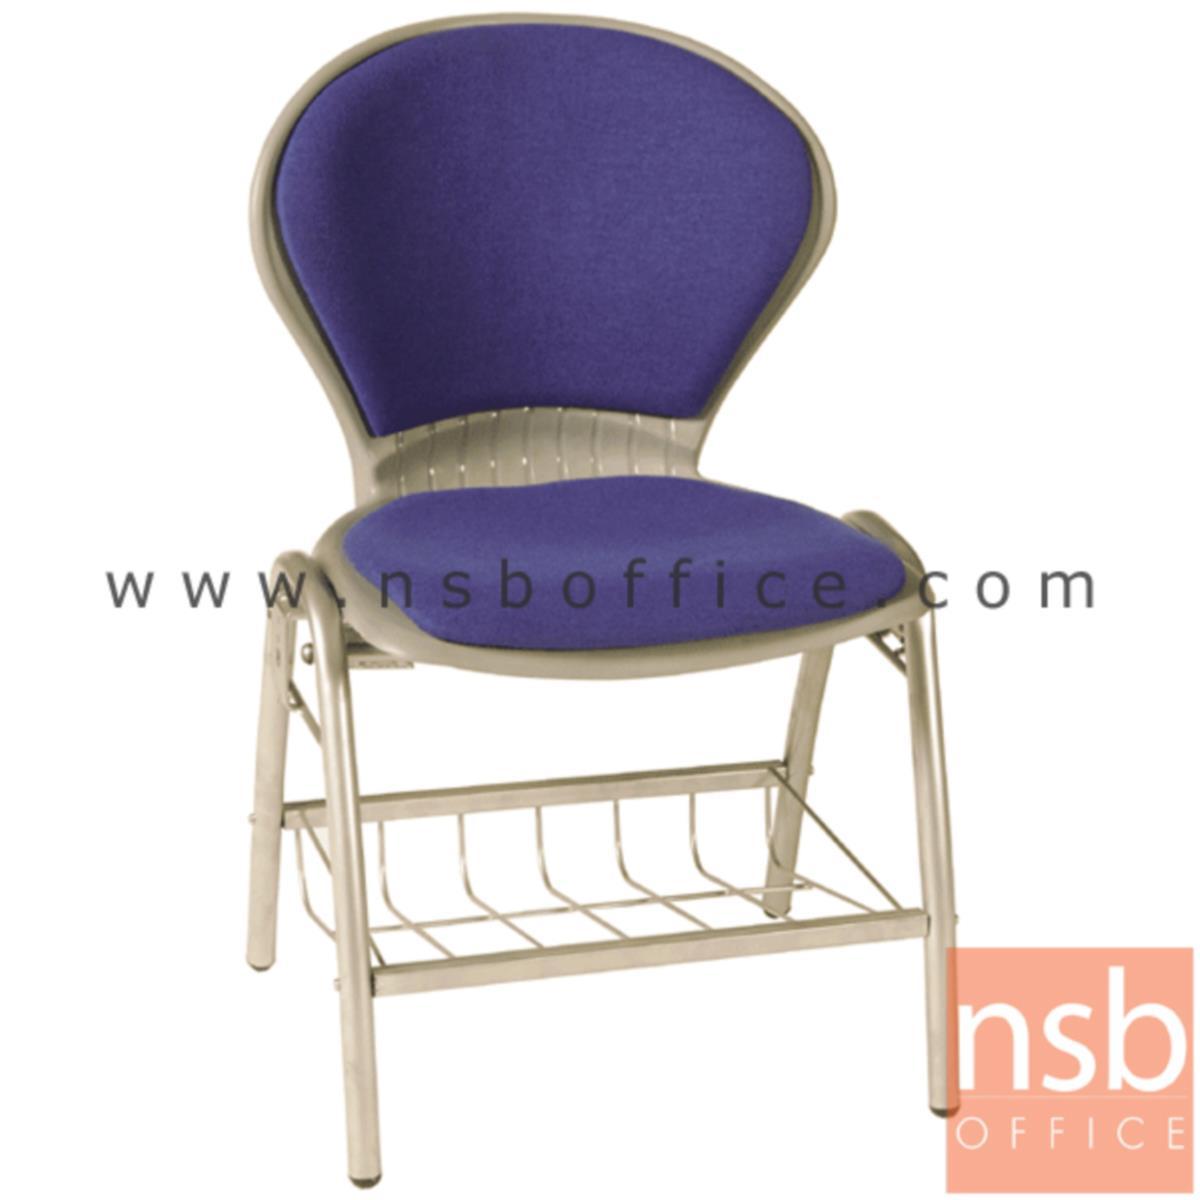 B05A048:เก้าอี้อเนกประสงค์เฟรมโพลี่ รุ่น A366  มีตะแกรงวางของ ขาเหล็ก